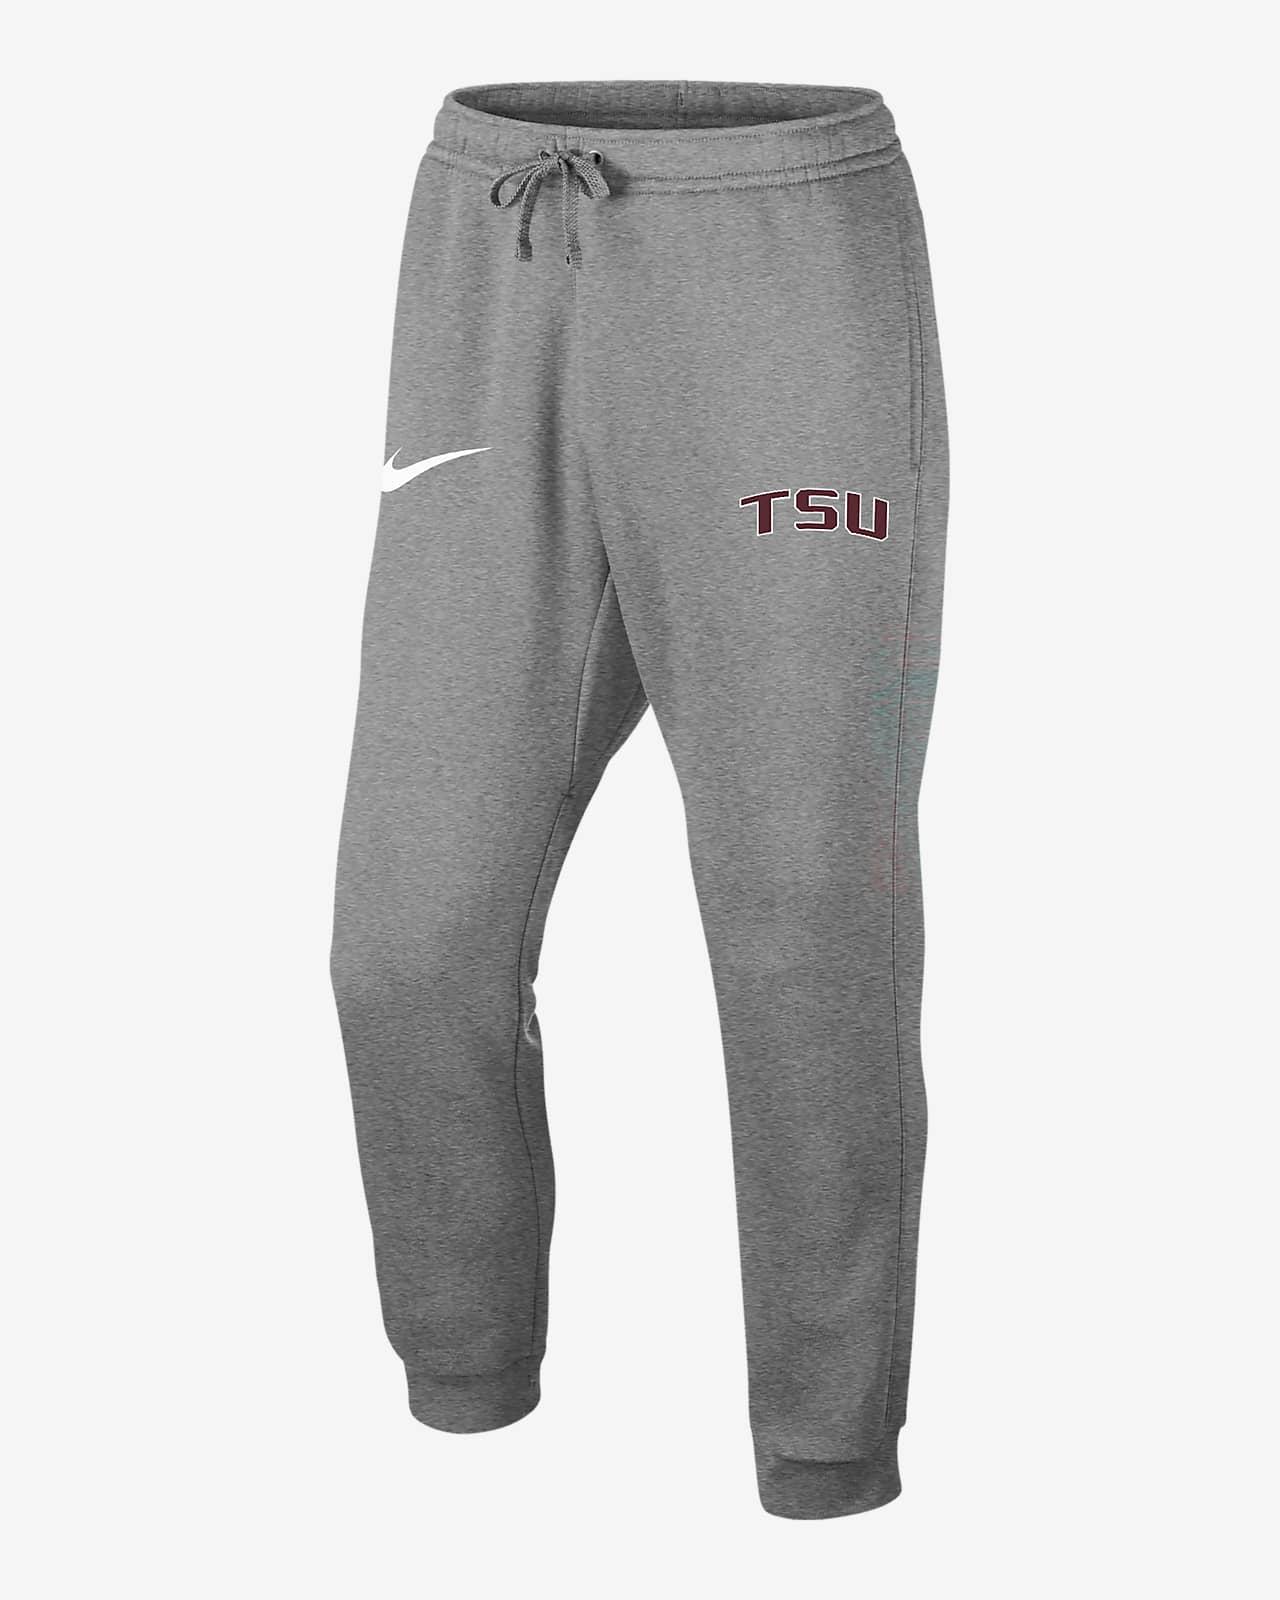 Nike College Club Fleece (Texas Southern) Joggers